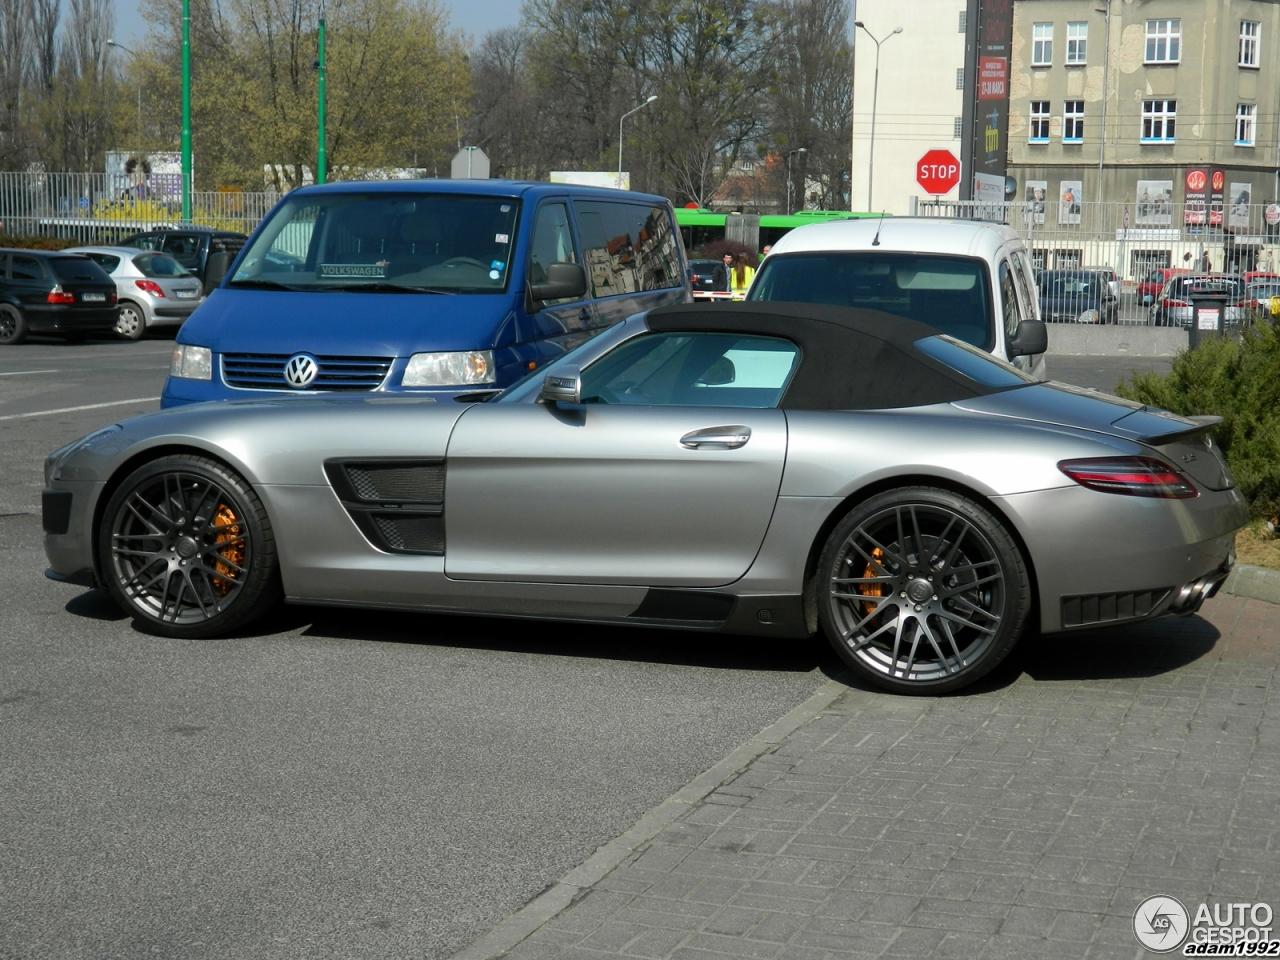 Mercedes Benz Brabus Sls Amg Roadster 29 March 2014